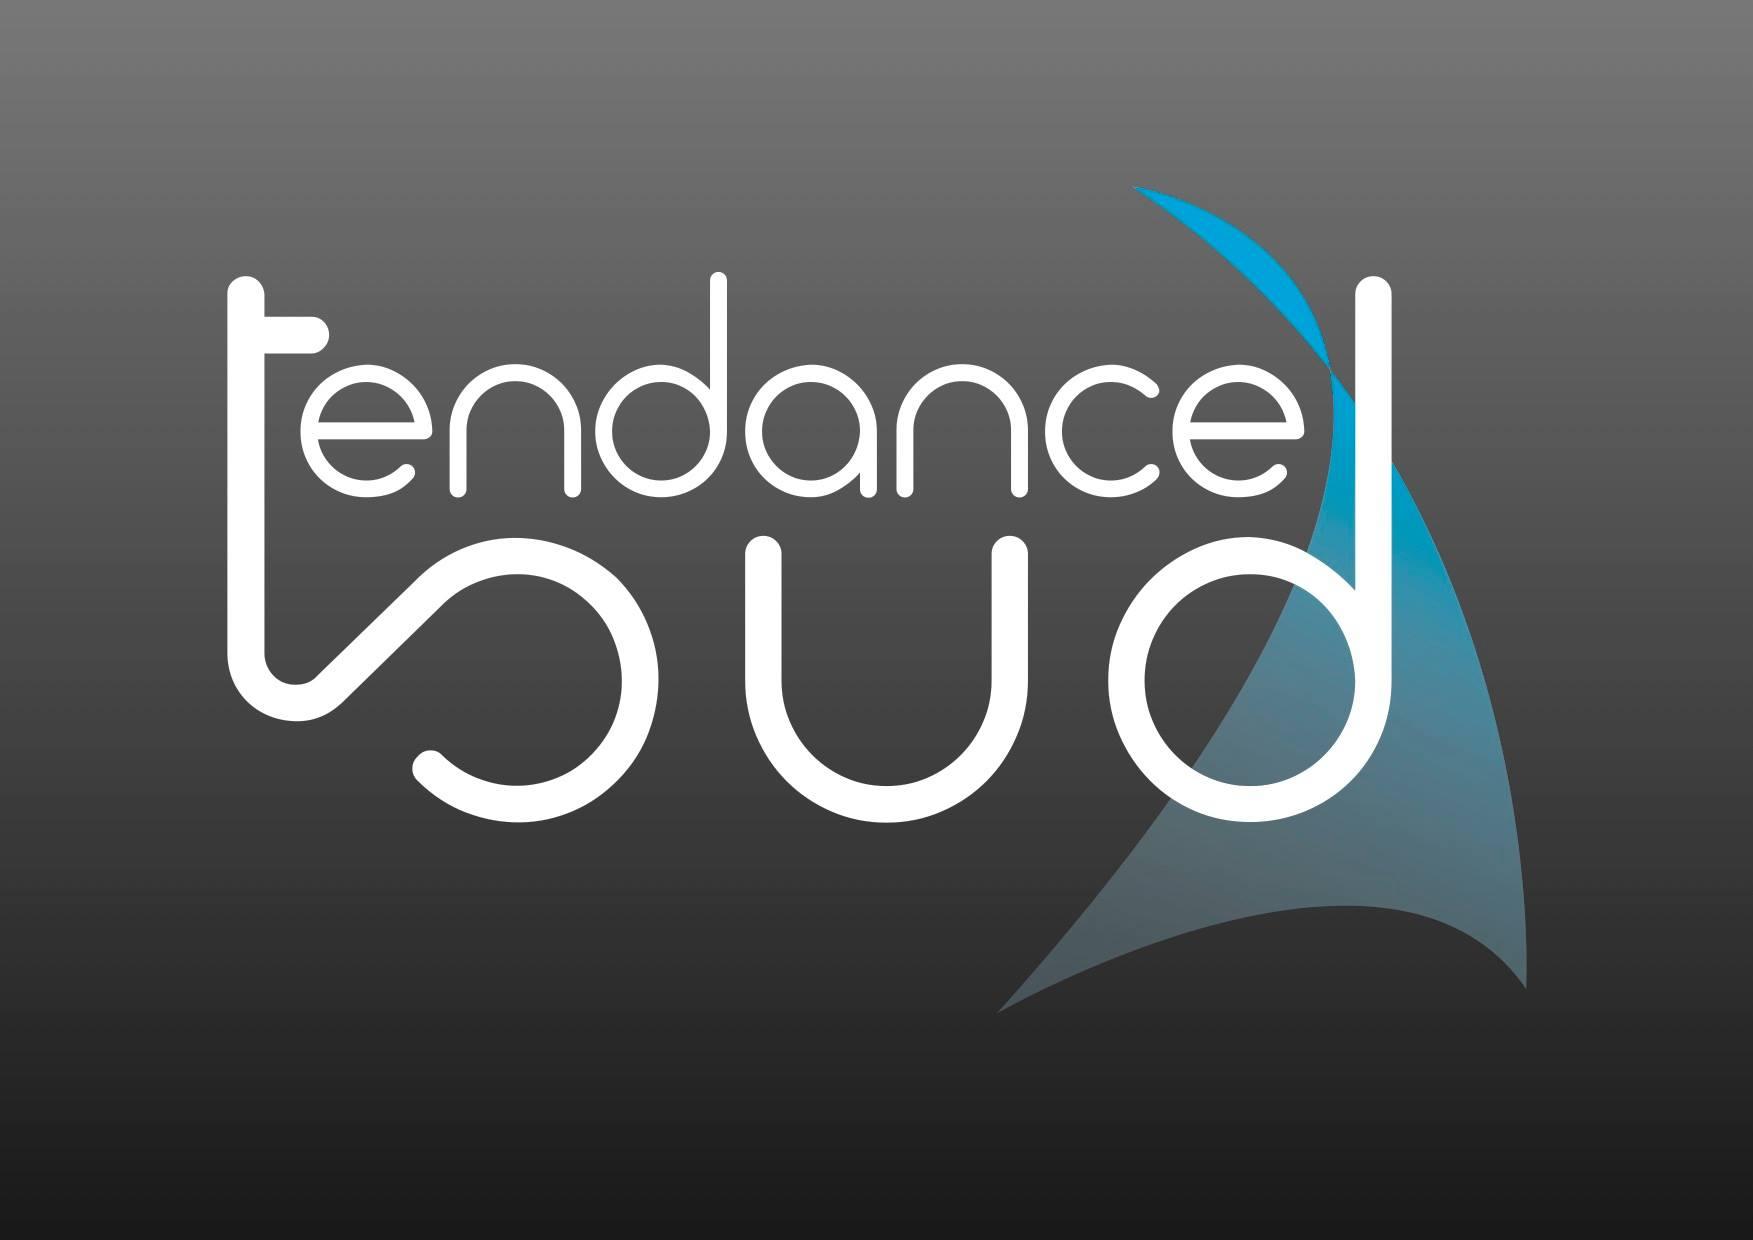 Tendance Location